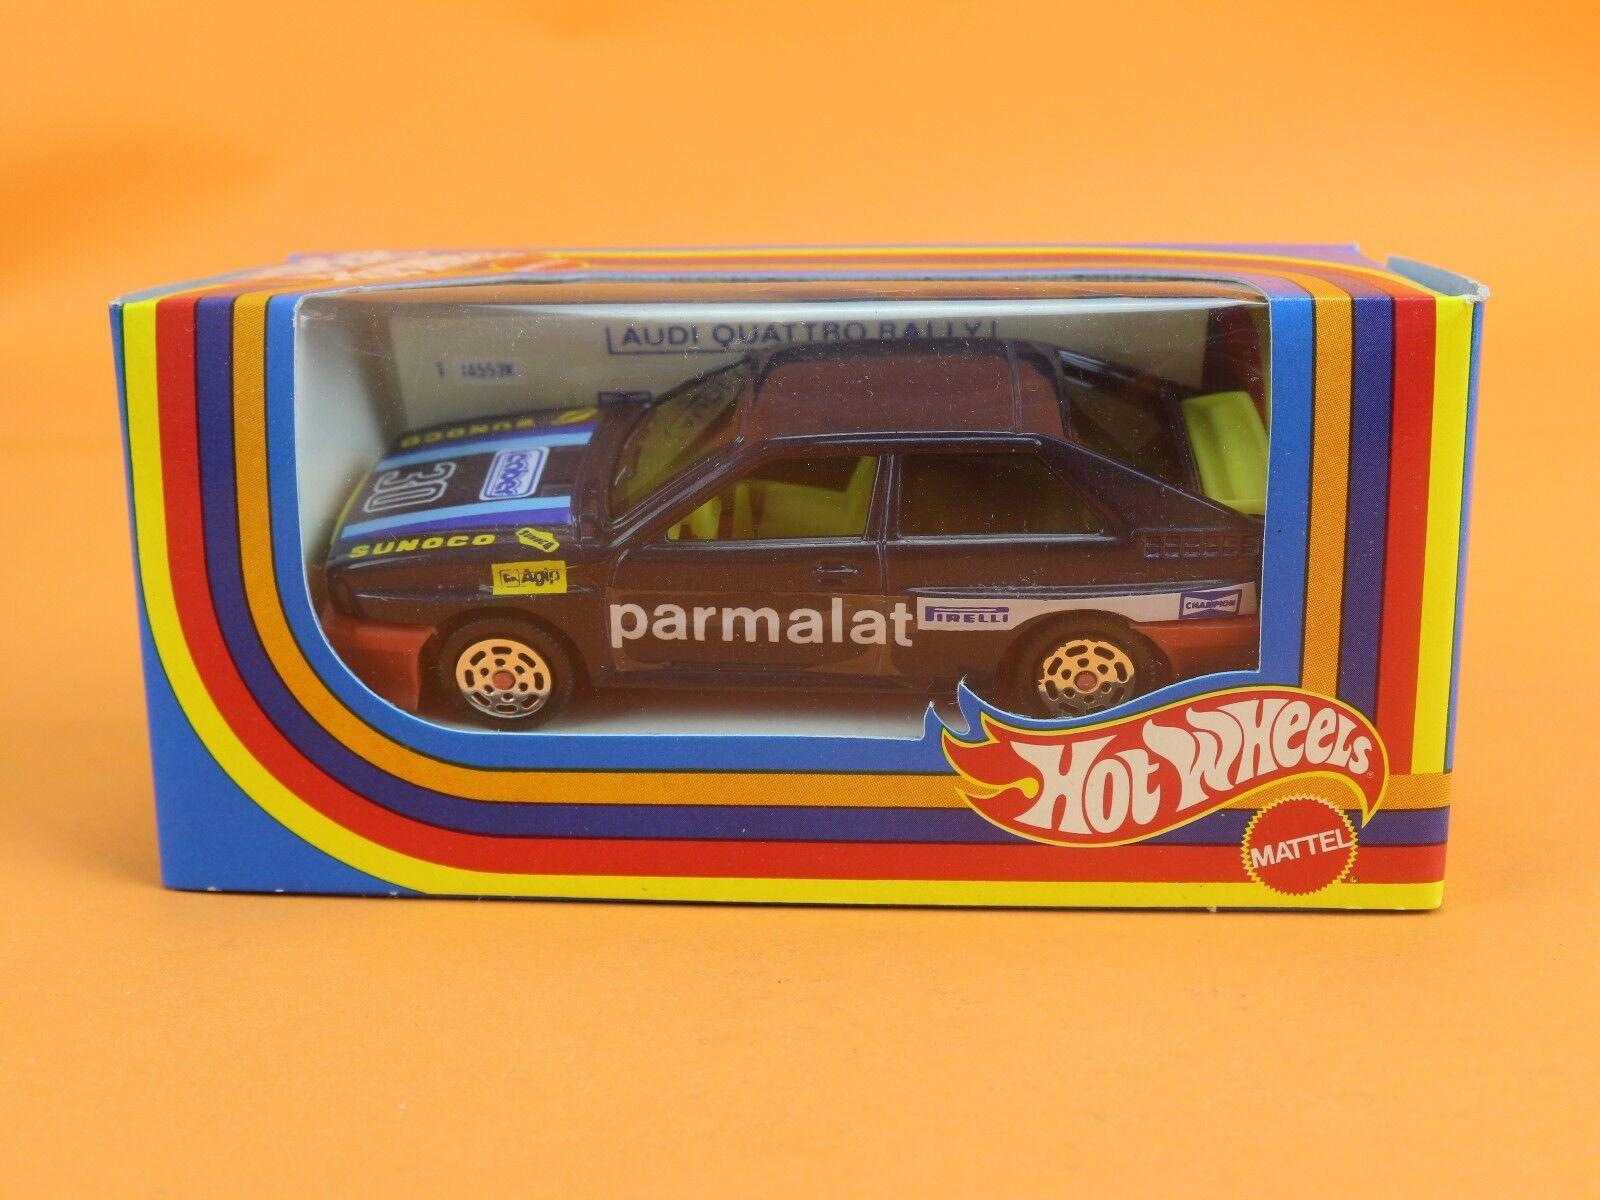 Mattel Super Hot Wheels 1 43 audi quattro 4 Rally COD. 6899 Bottom Mag [oh3-054]